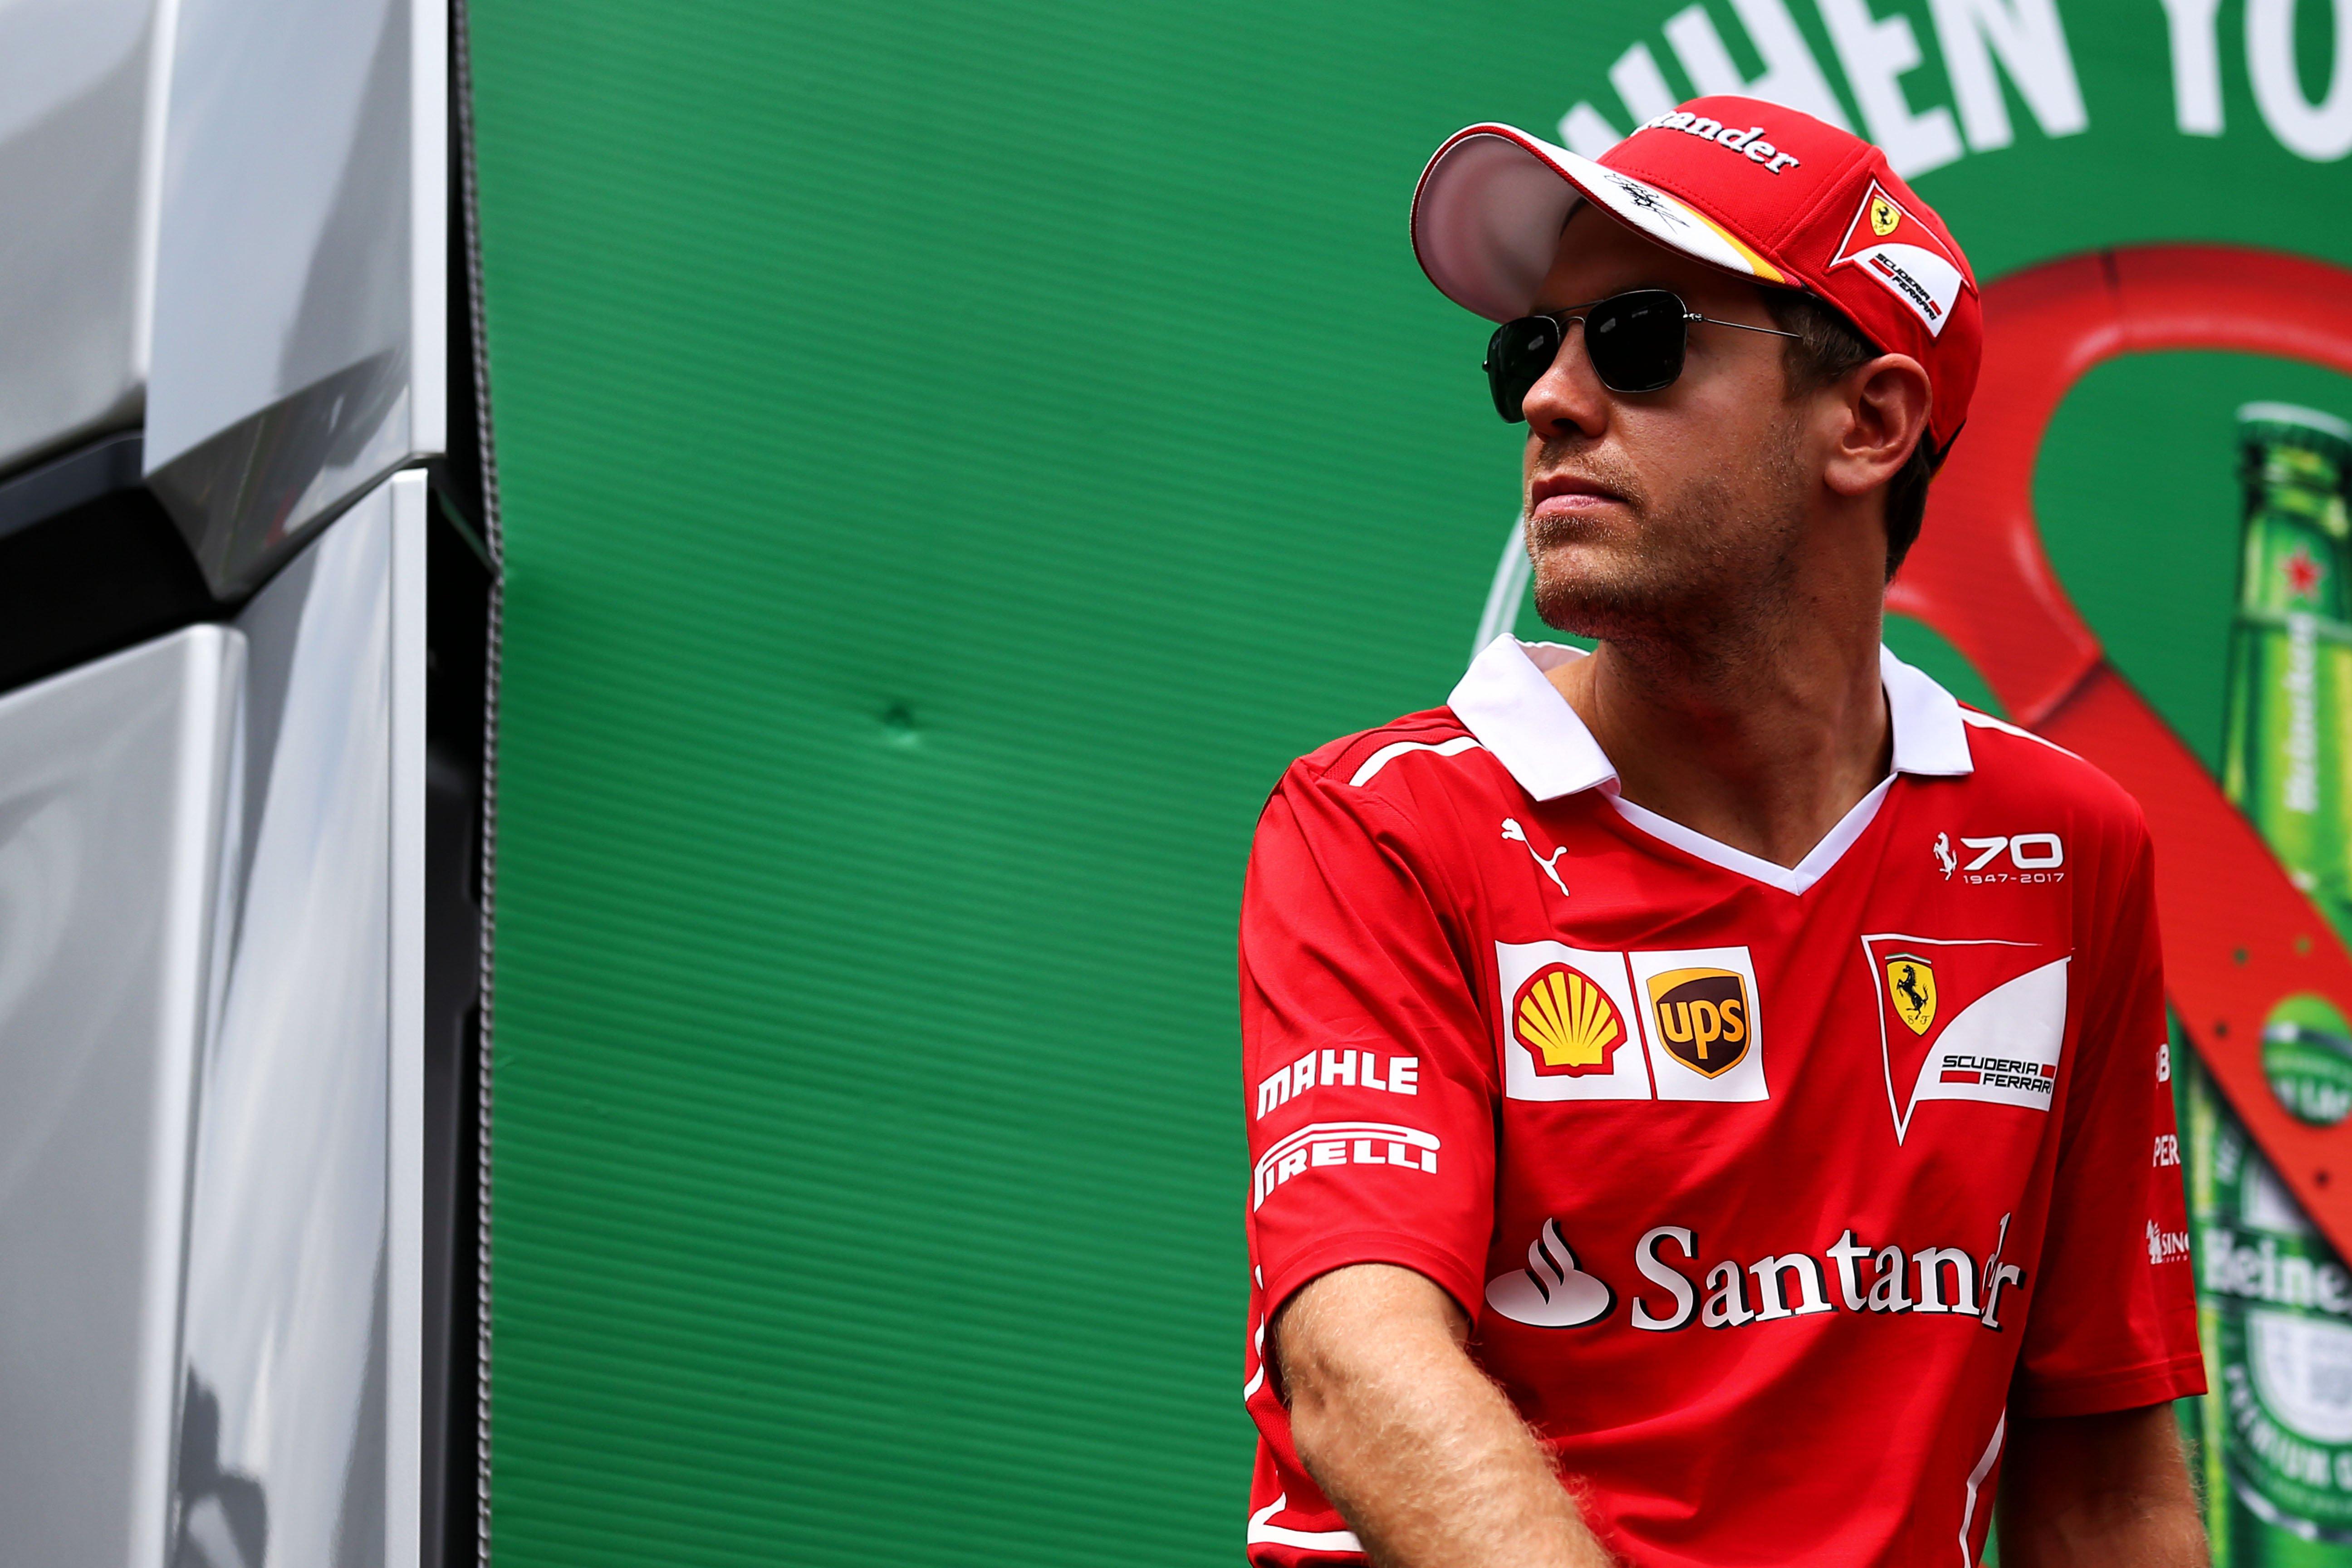 Formula One World Championship 2017, Round 9, Austrian Grand Prix, Spielberg, Austria, Sunday 9 July 2017 – Sebastian Vettel (GER) Ferrari on the drivers parade.